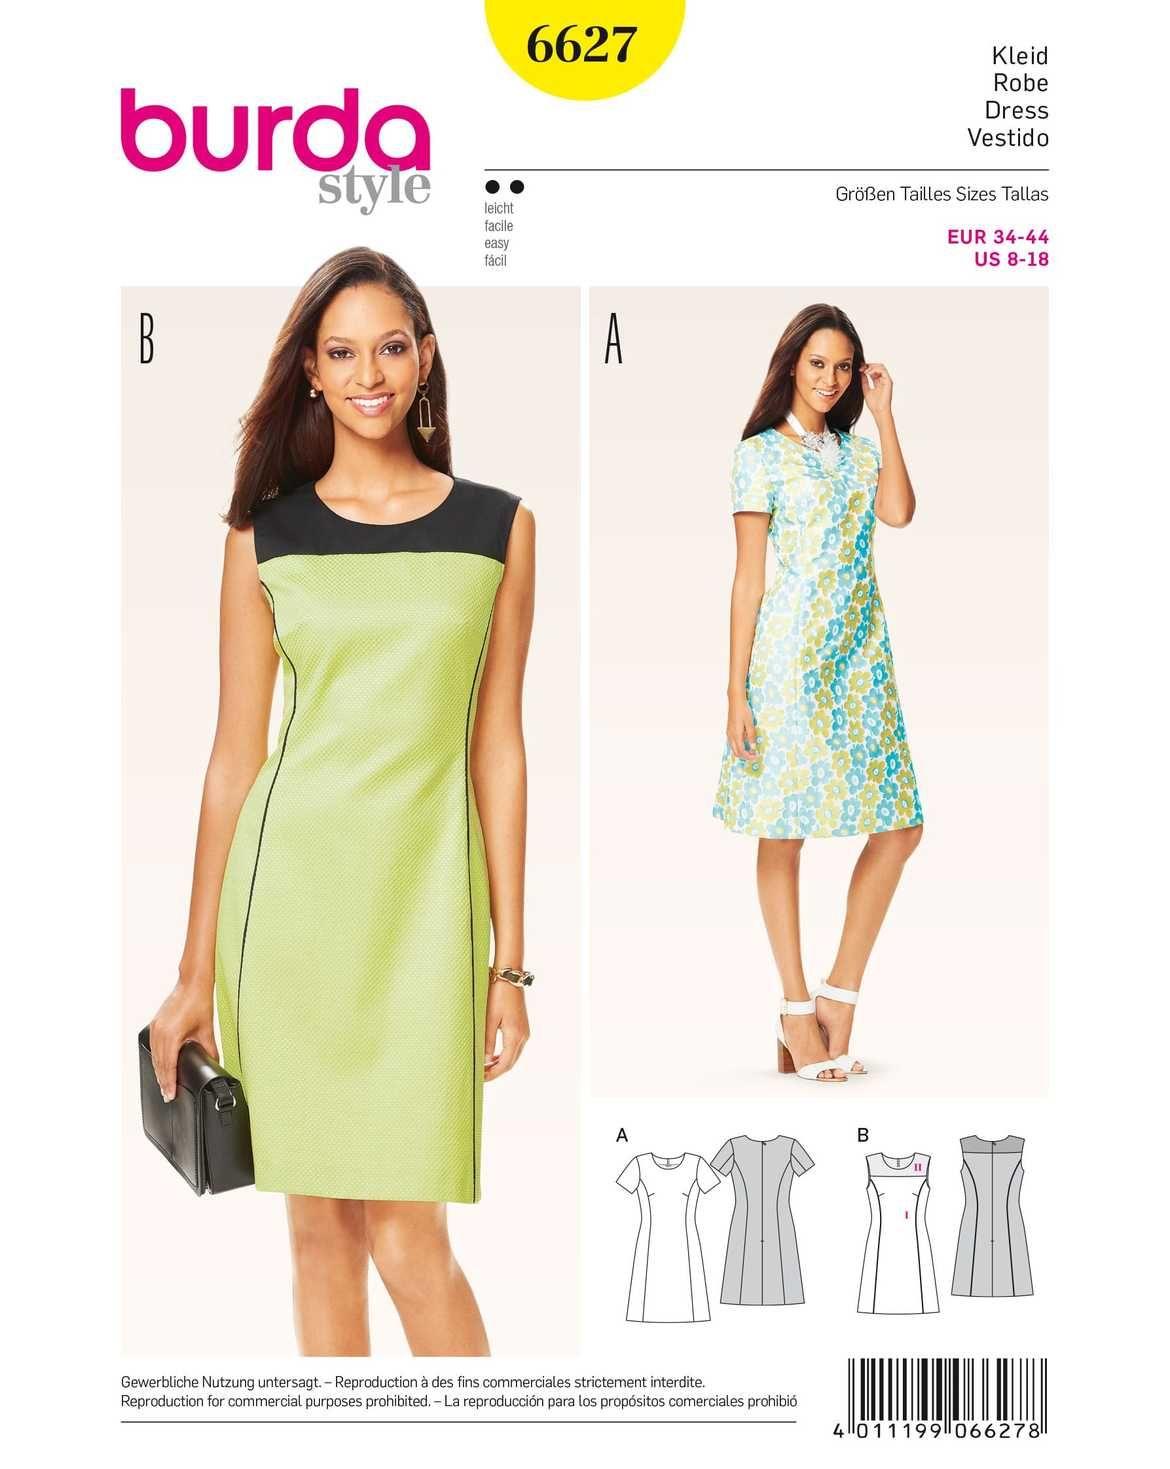 burda style, Schnittmuster, Kleid F/S 2016 #662 | Mode zum selber ...